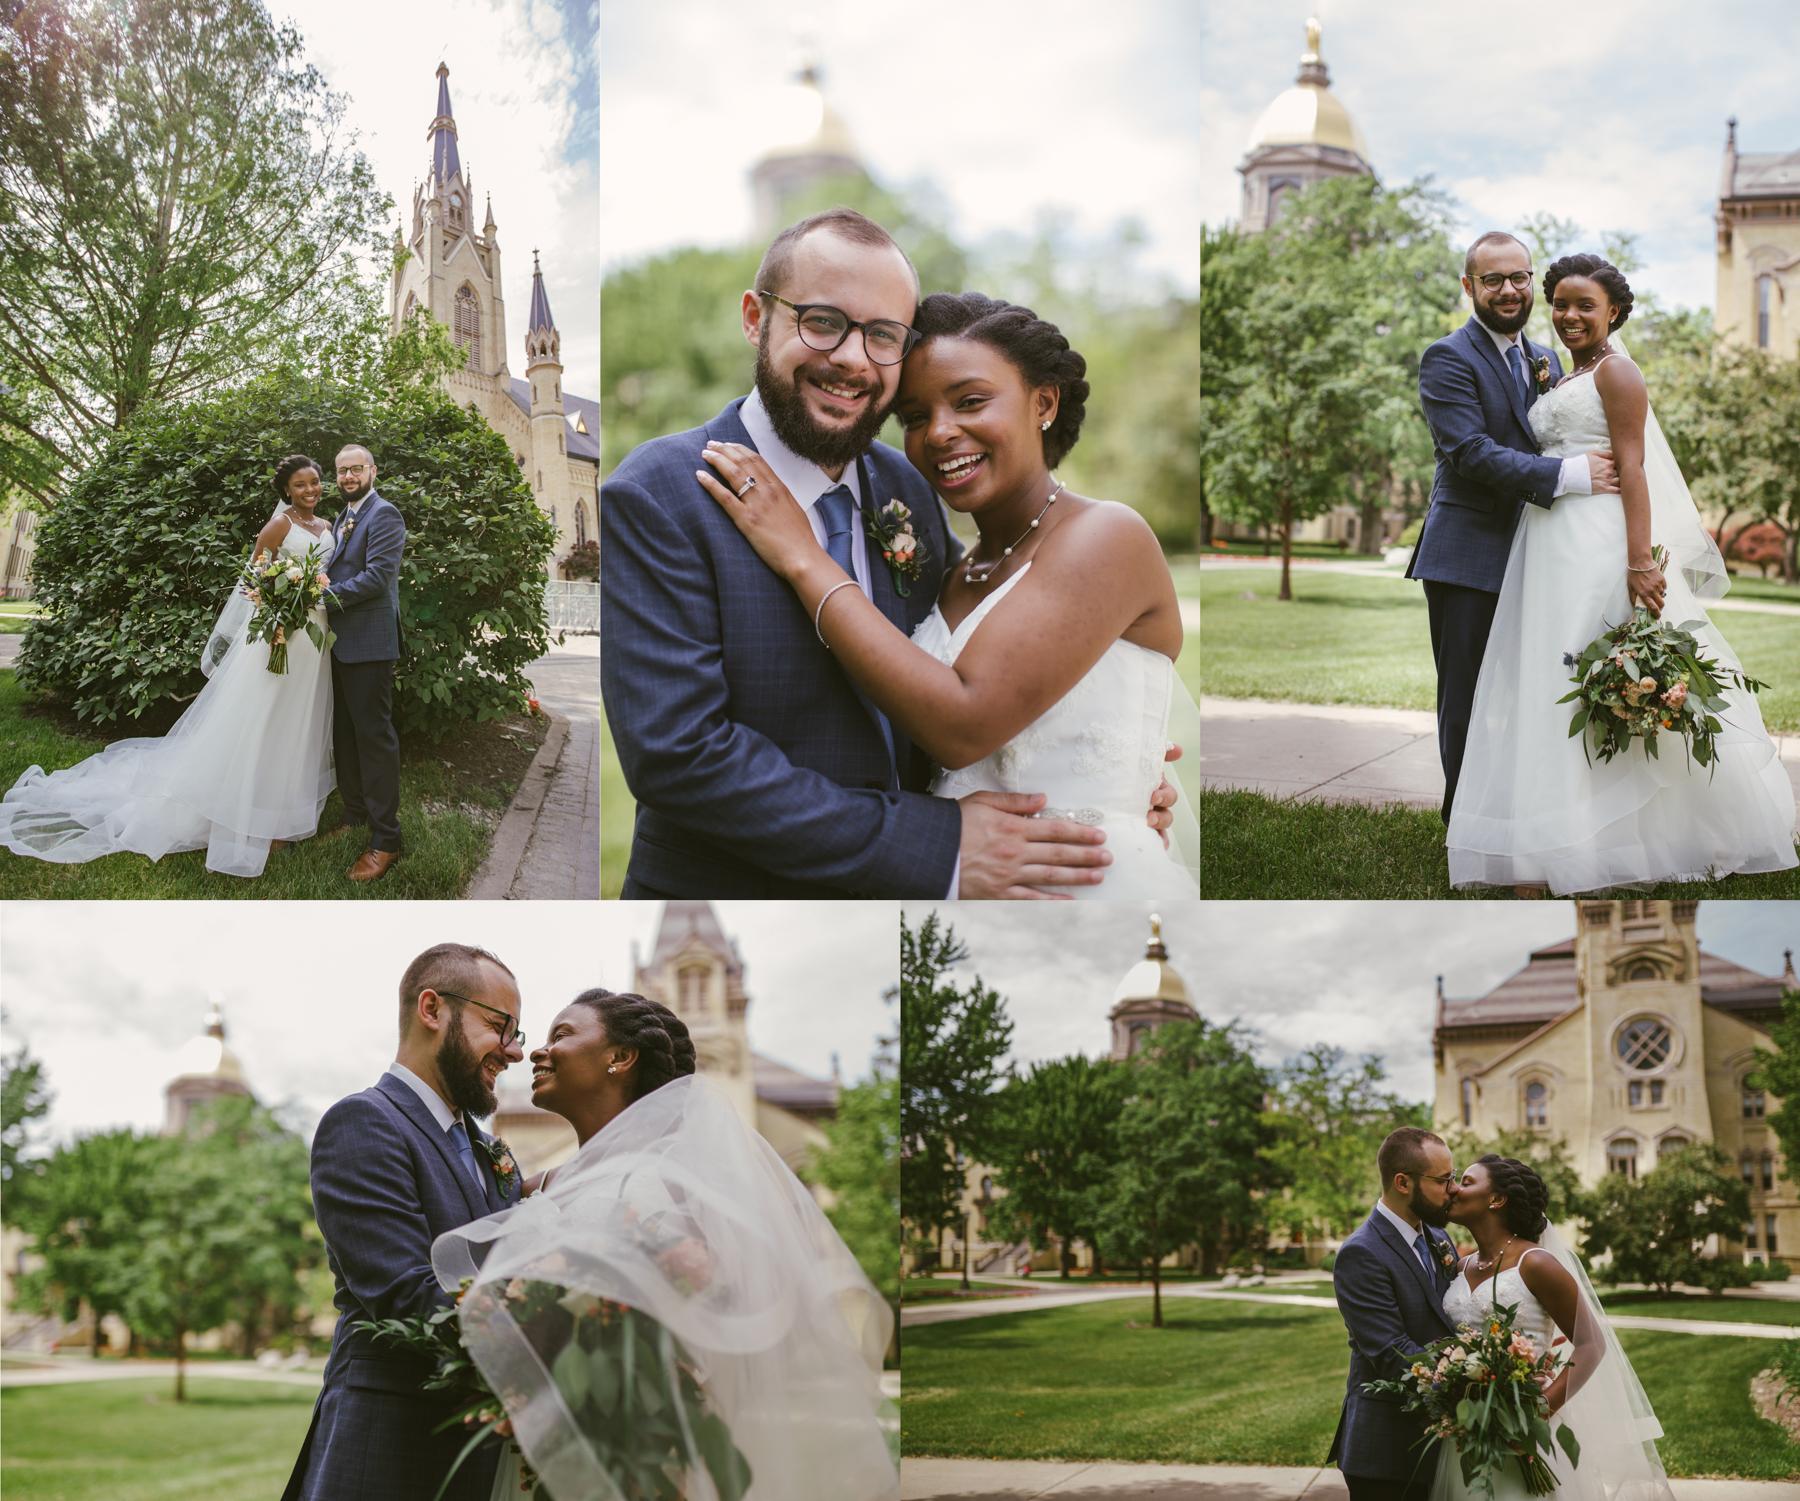 031 may-jimmy-notre-dame-wedding.jpg